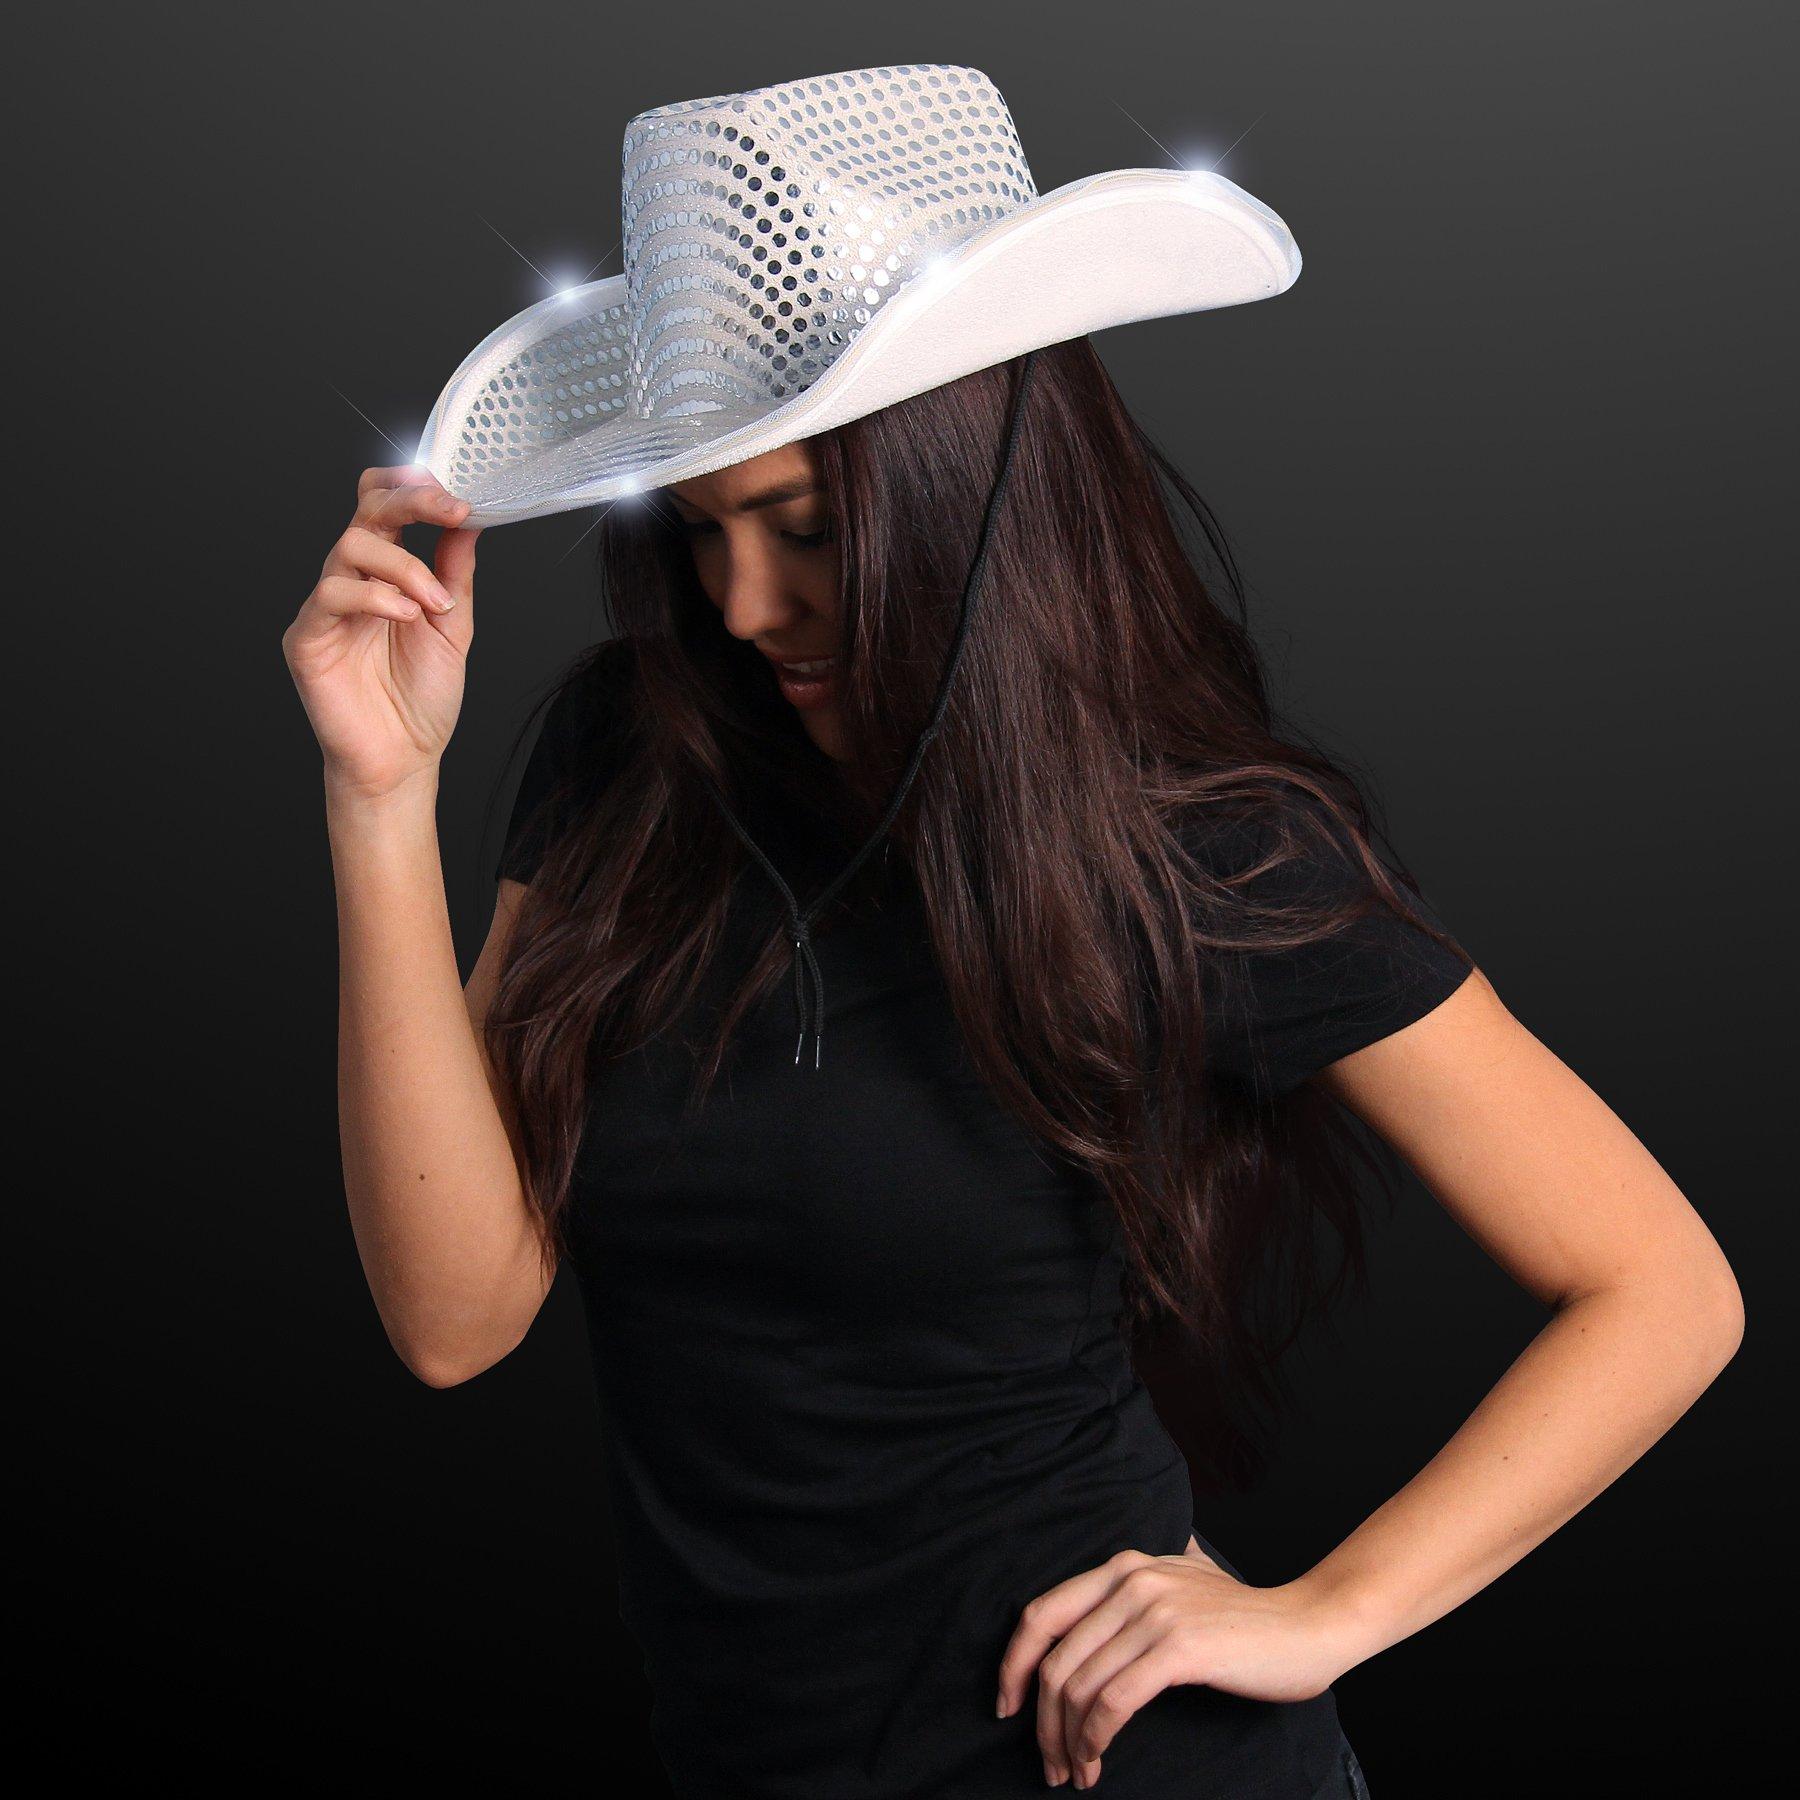 FlashingBlinkyLights Silver Sequin Light Up LED Cowboy Hat by FlashingBlinkyLights